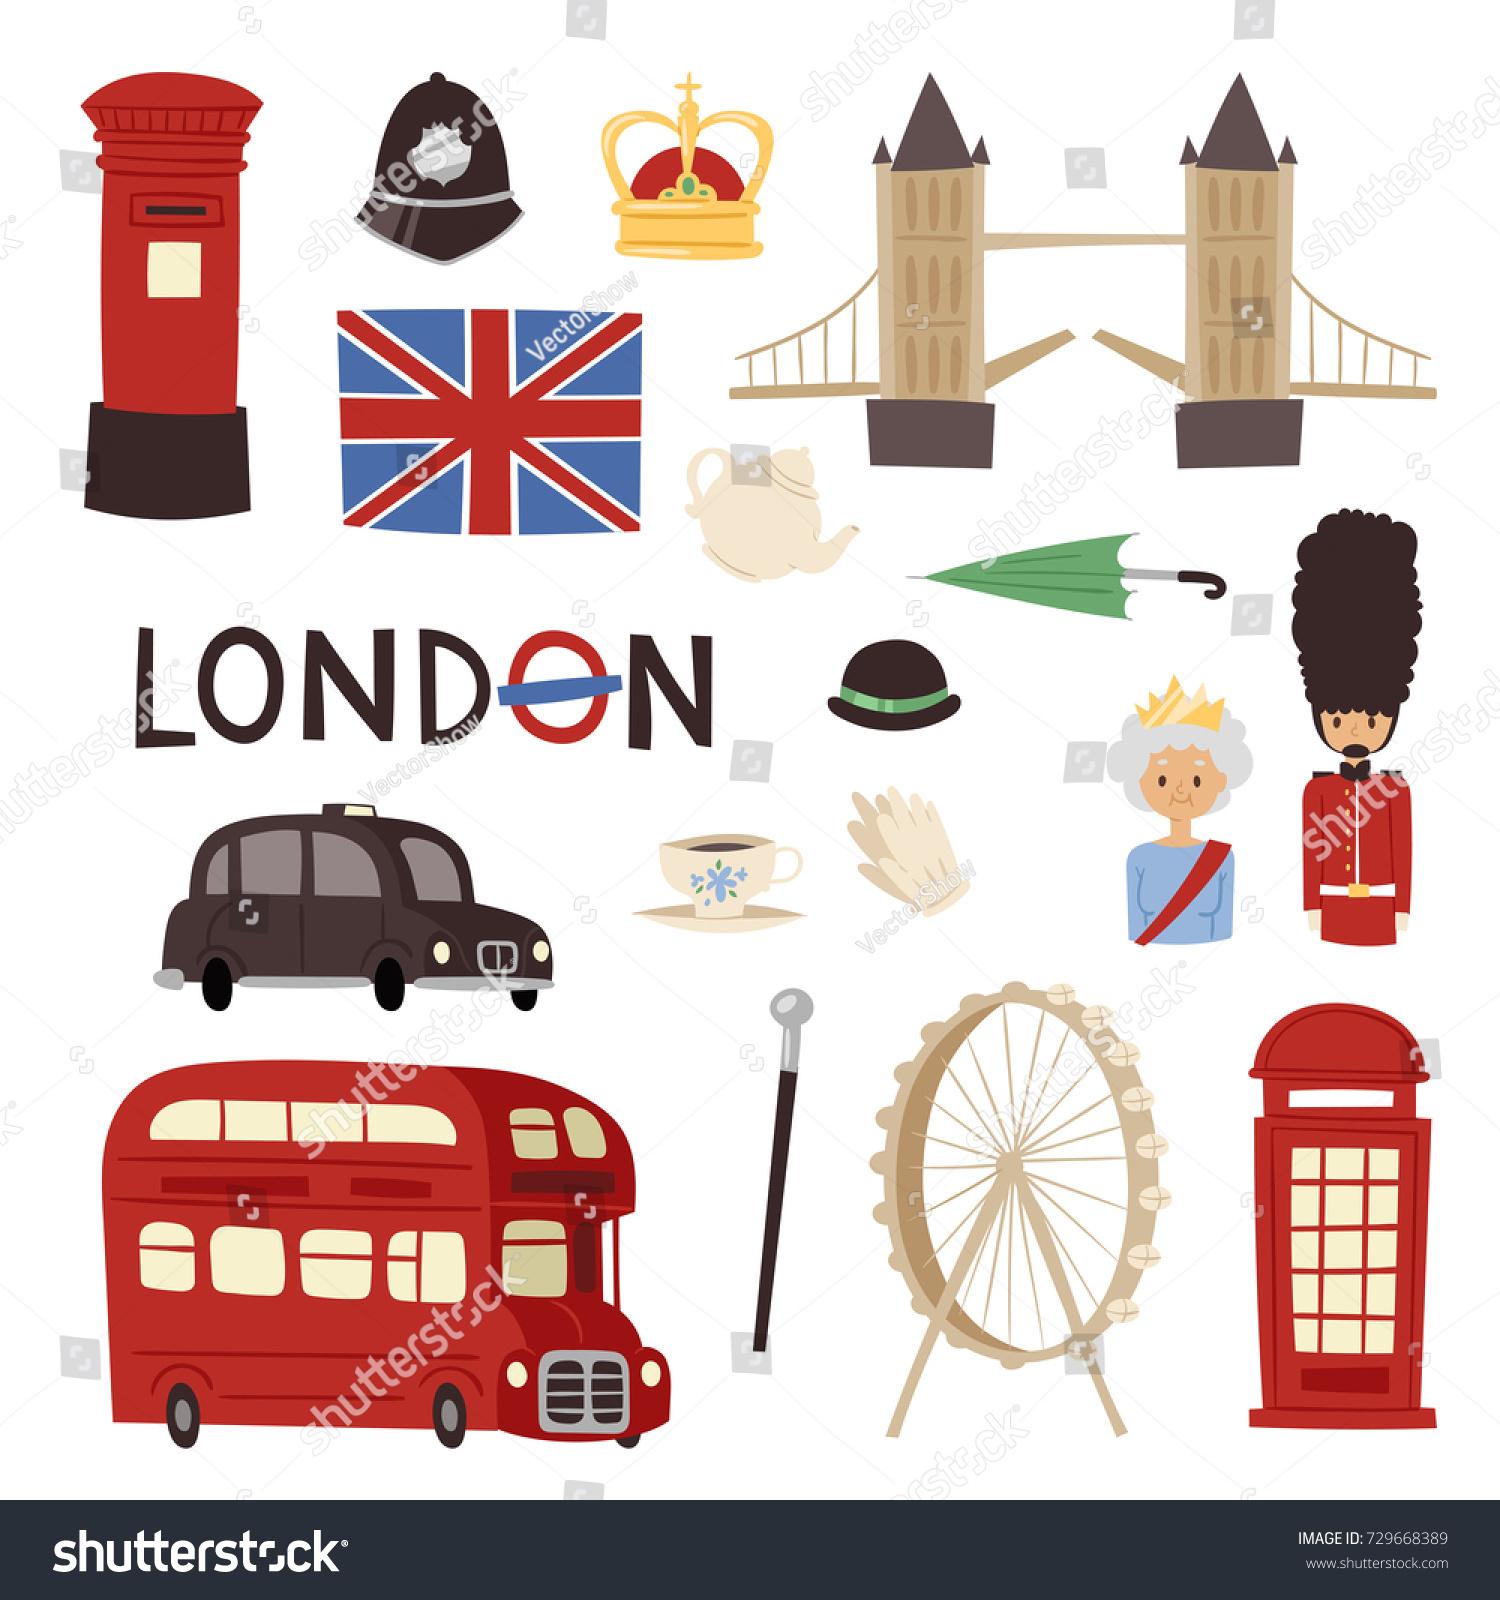 London Travel Icons English Set City Stock-Vektorgrafik (Lizenzfrei ...